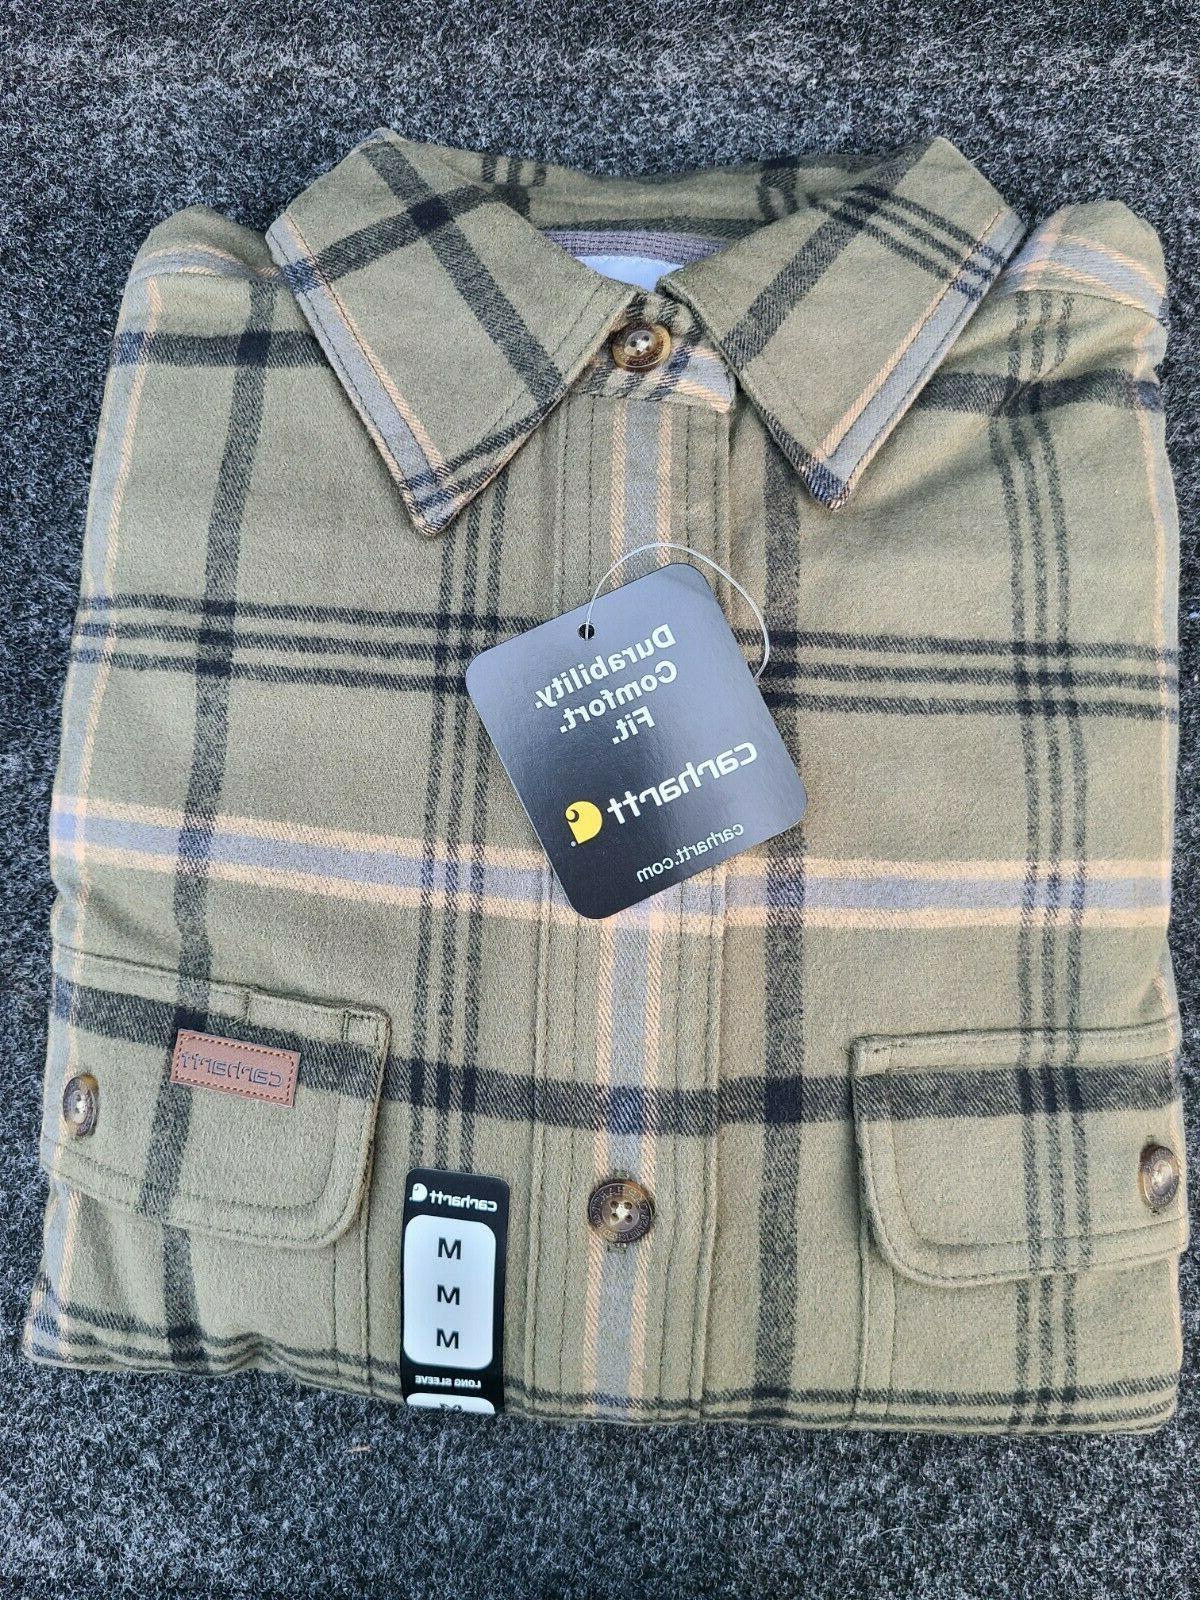 Carhartt Cotton 100% Pocket Work Shirts Flannel Size